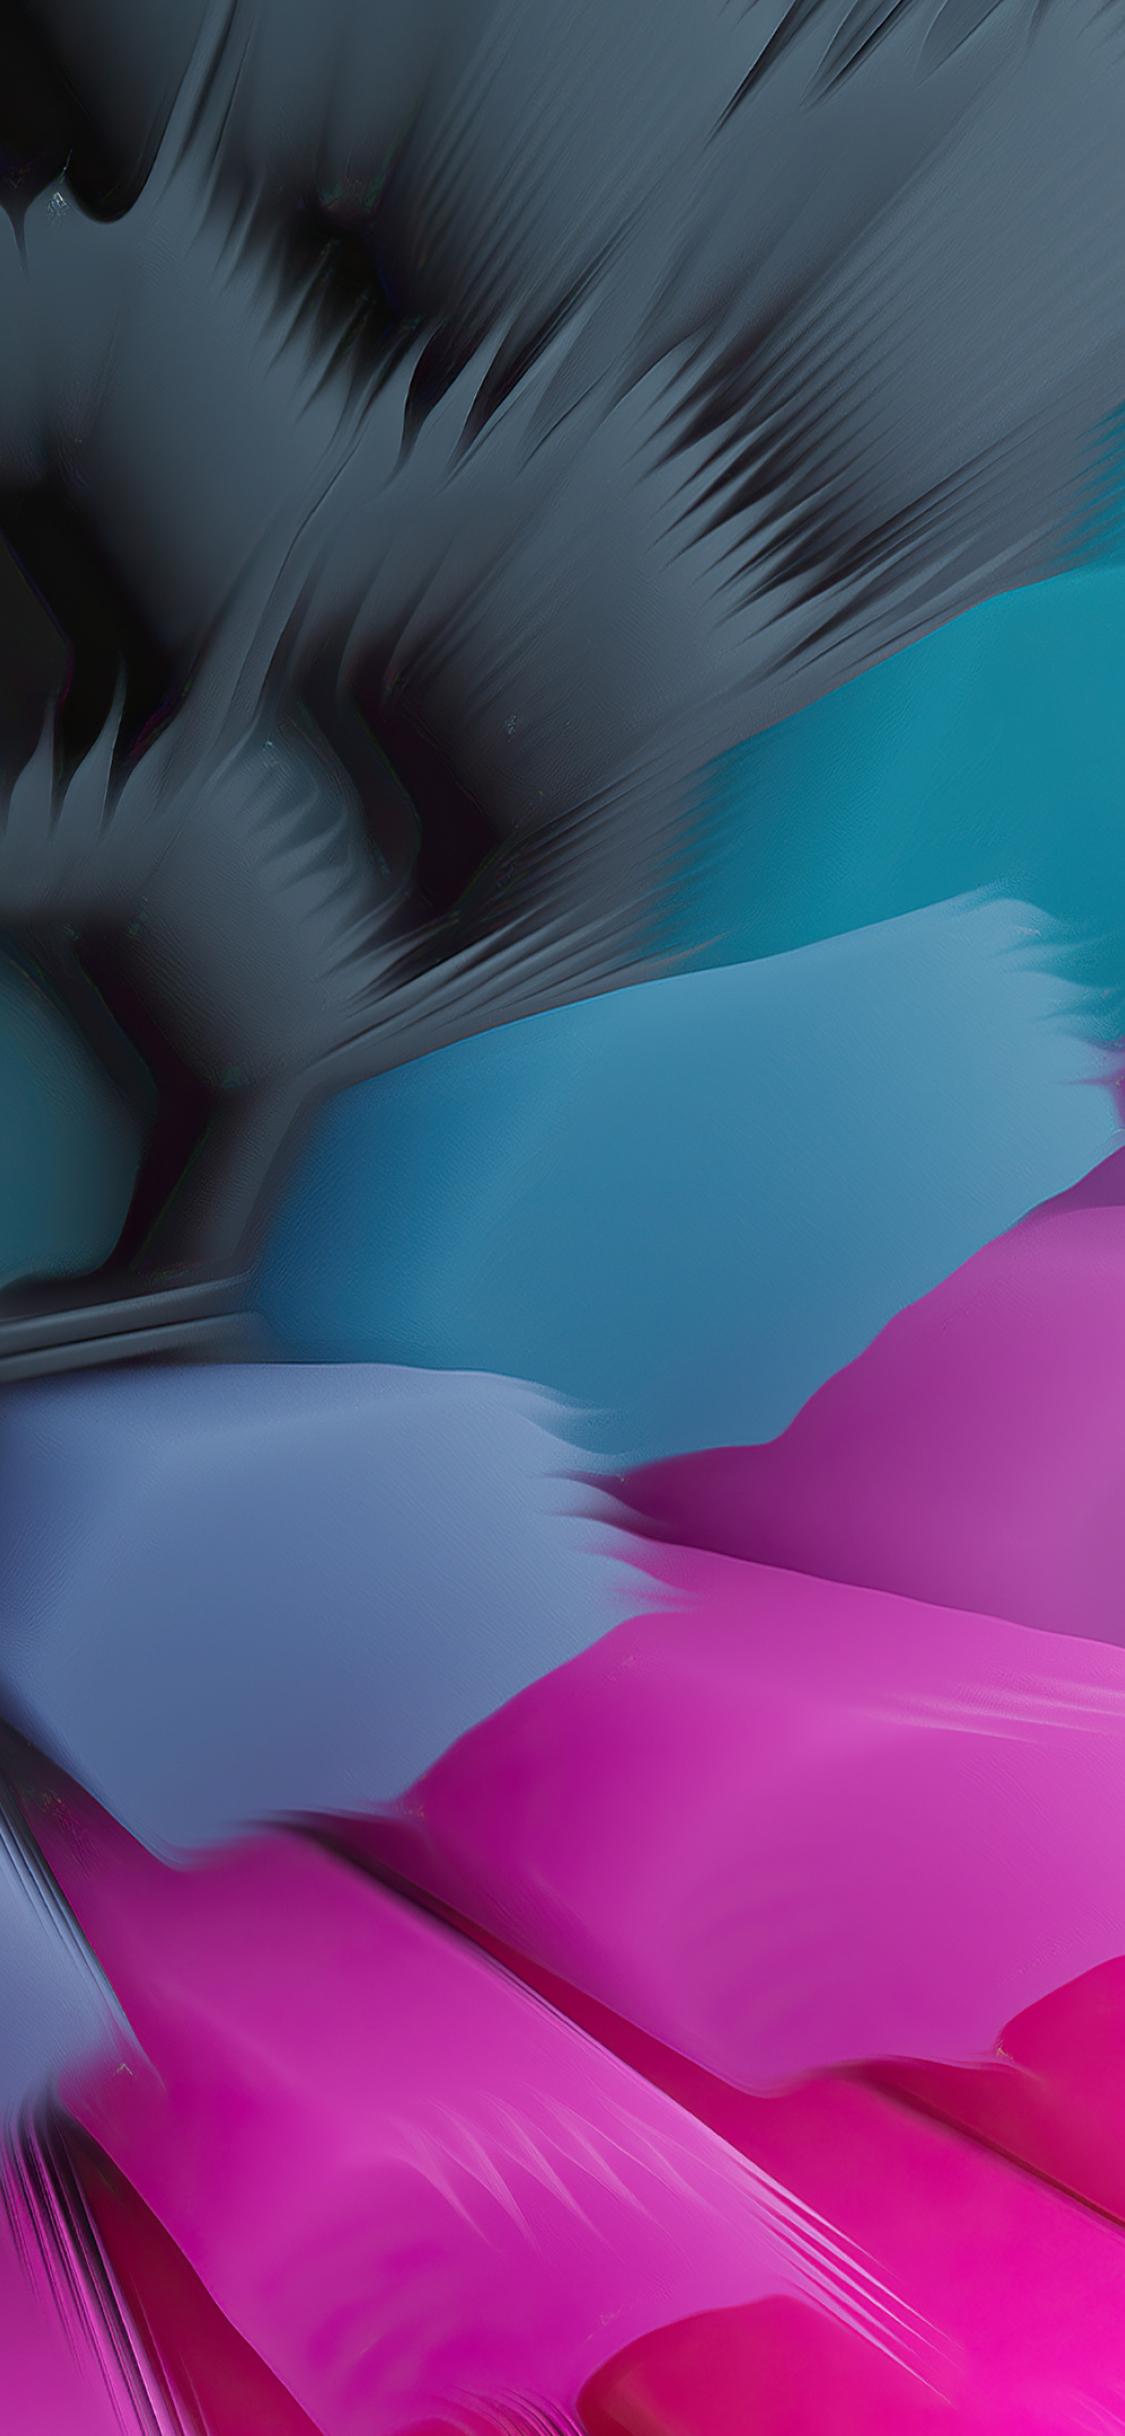 Pink Blue 4K Hexagon Wallpaper in 1125x2436 Resolution